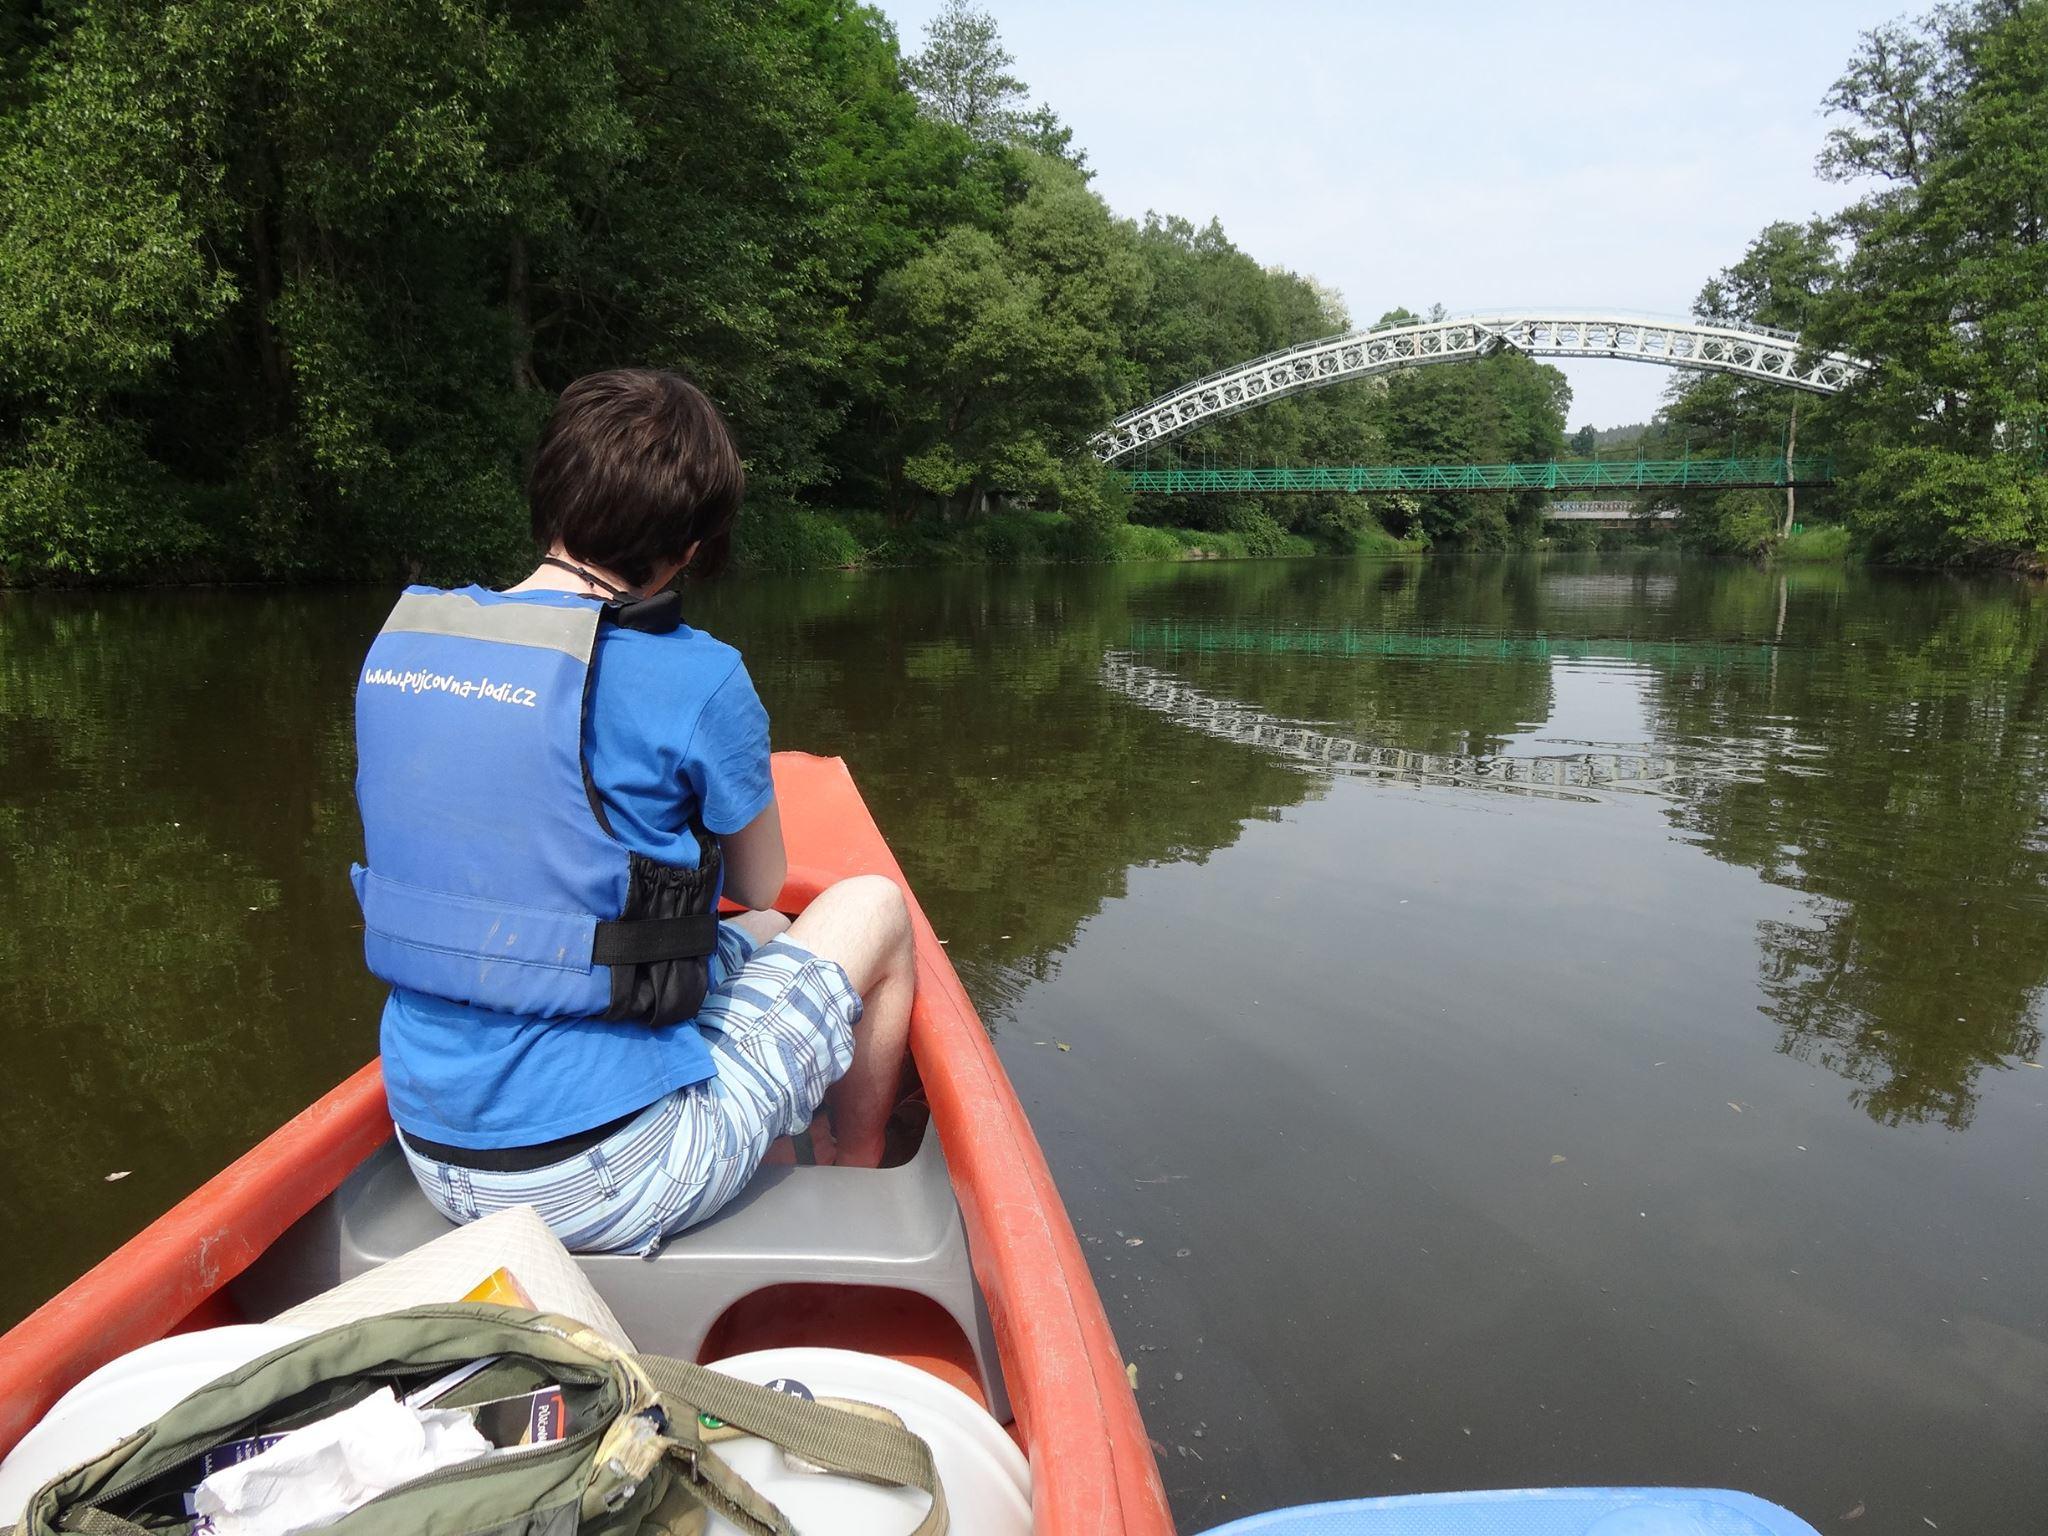 hikaru tenshin hokonono canoe vest